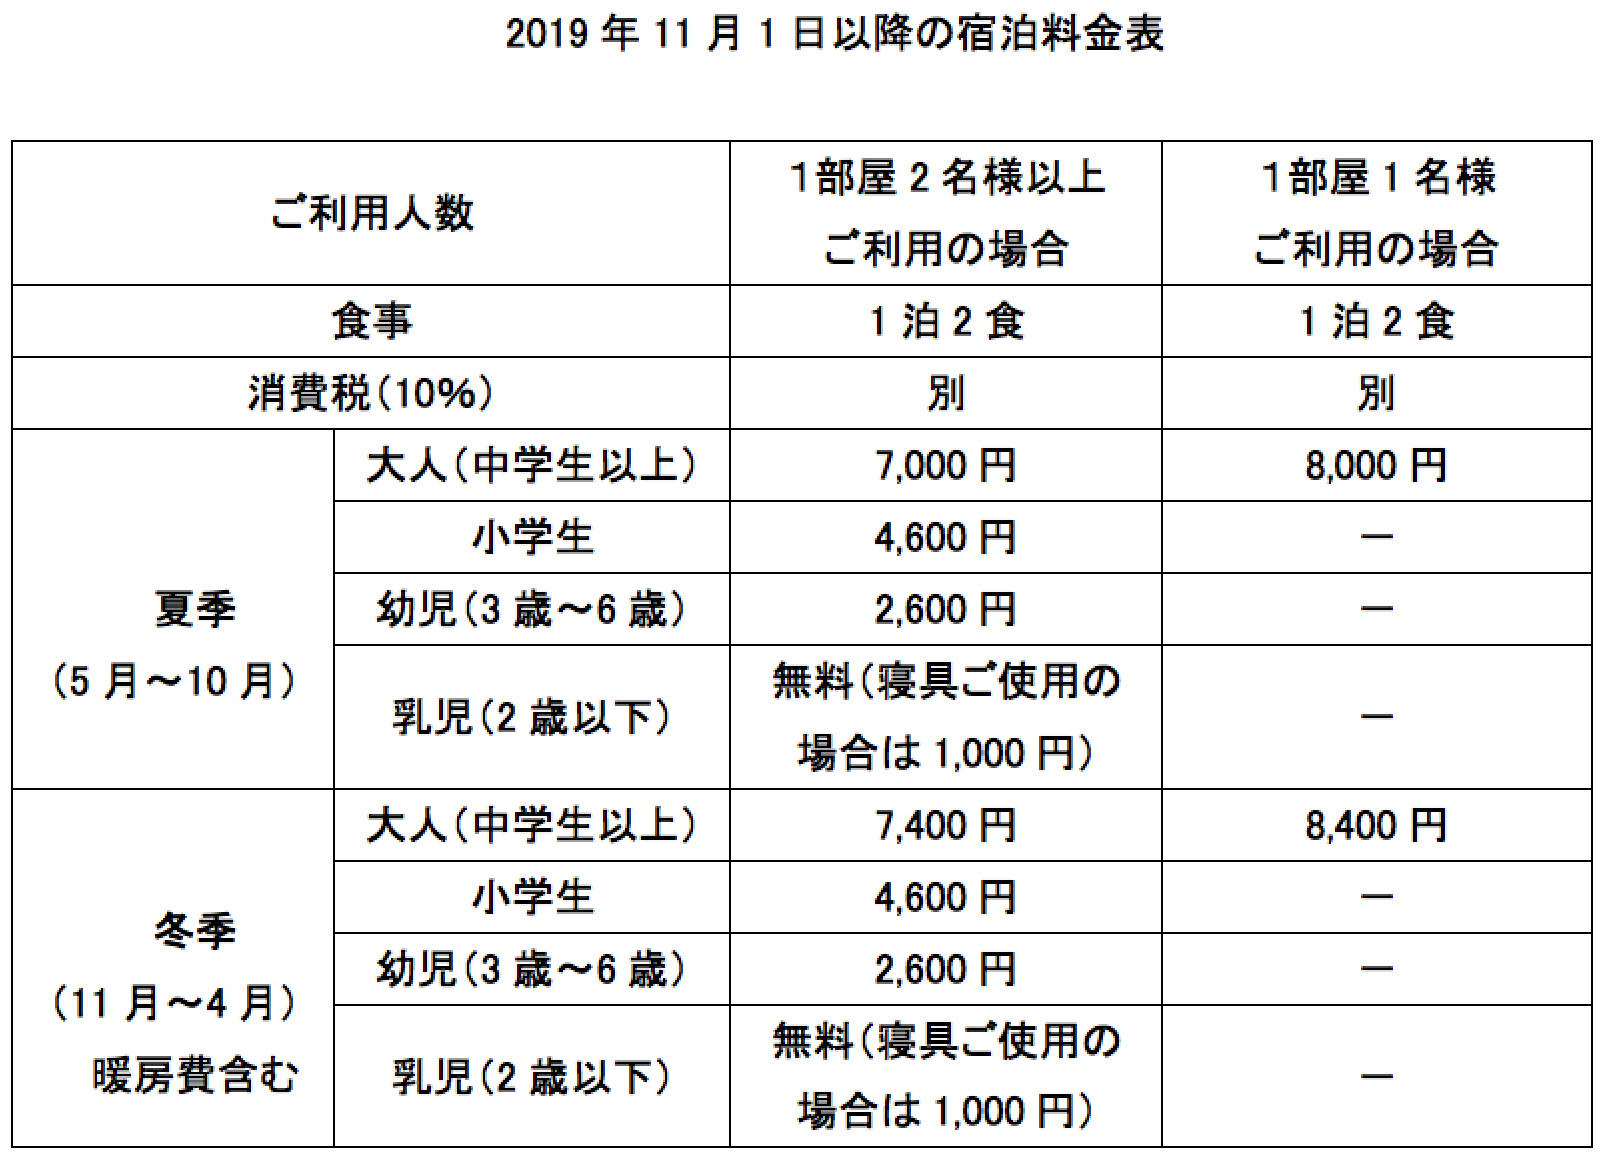 2019年11月1日以降の宿泊料金表